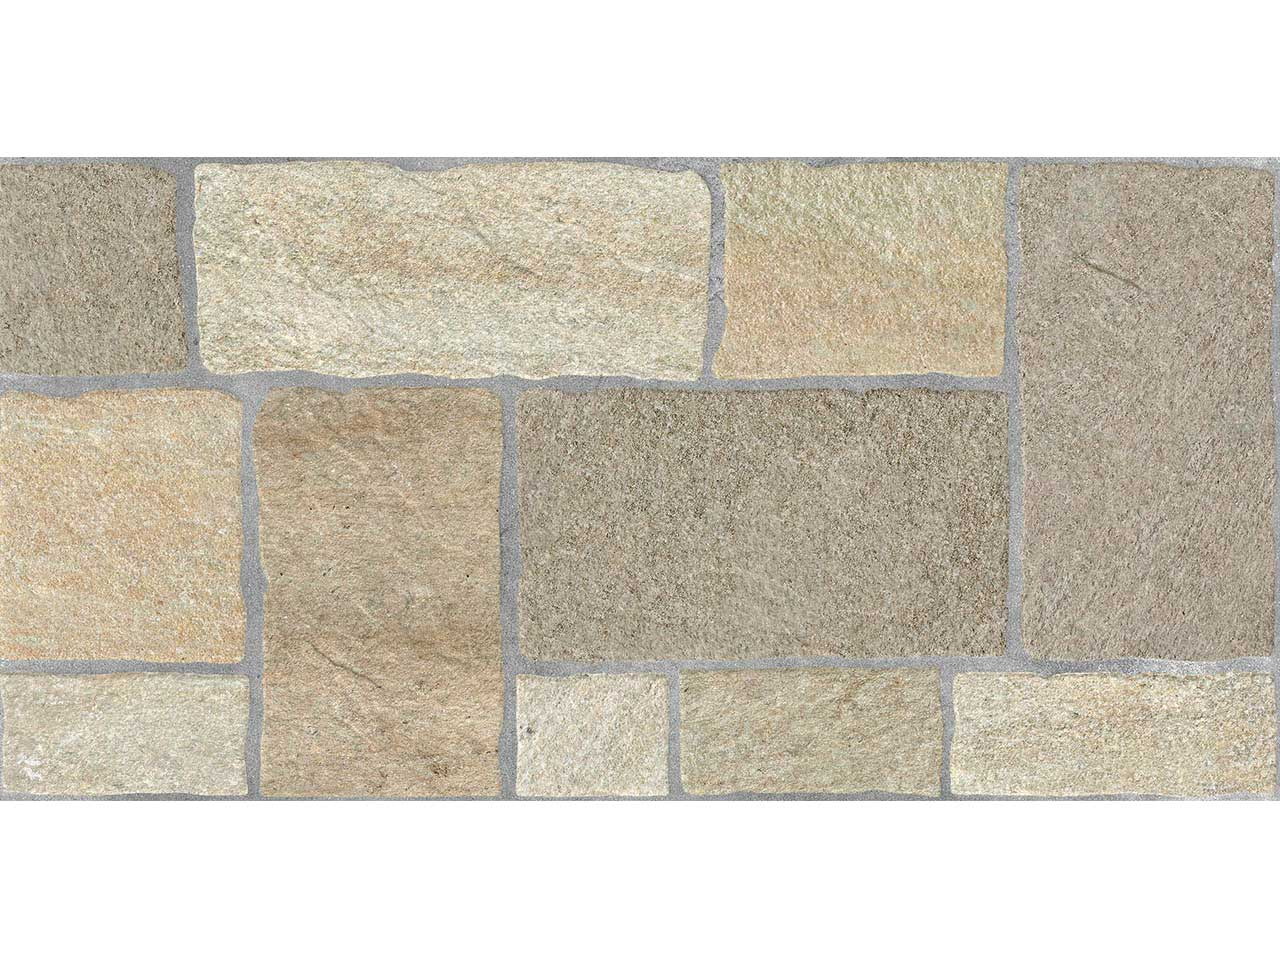 Villas petra beige 30x60 iperceramica for Pavimento esterno effetto pietra